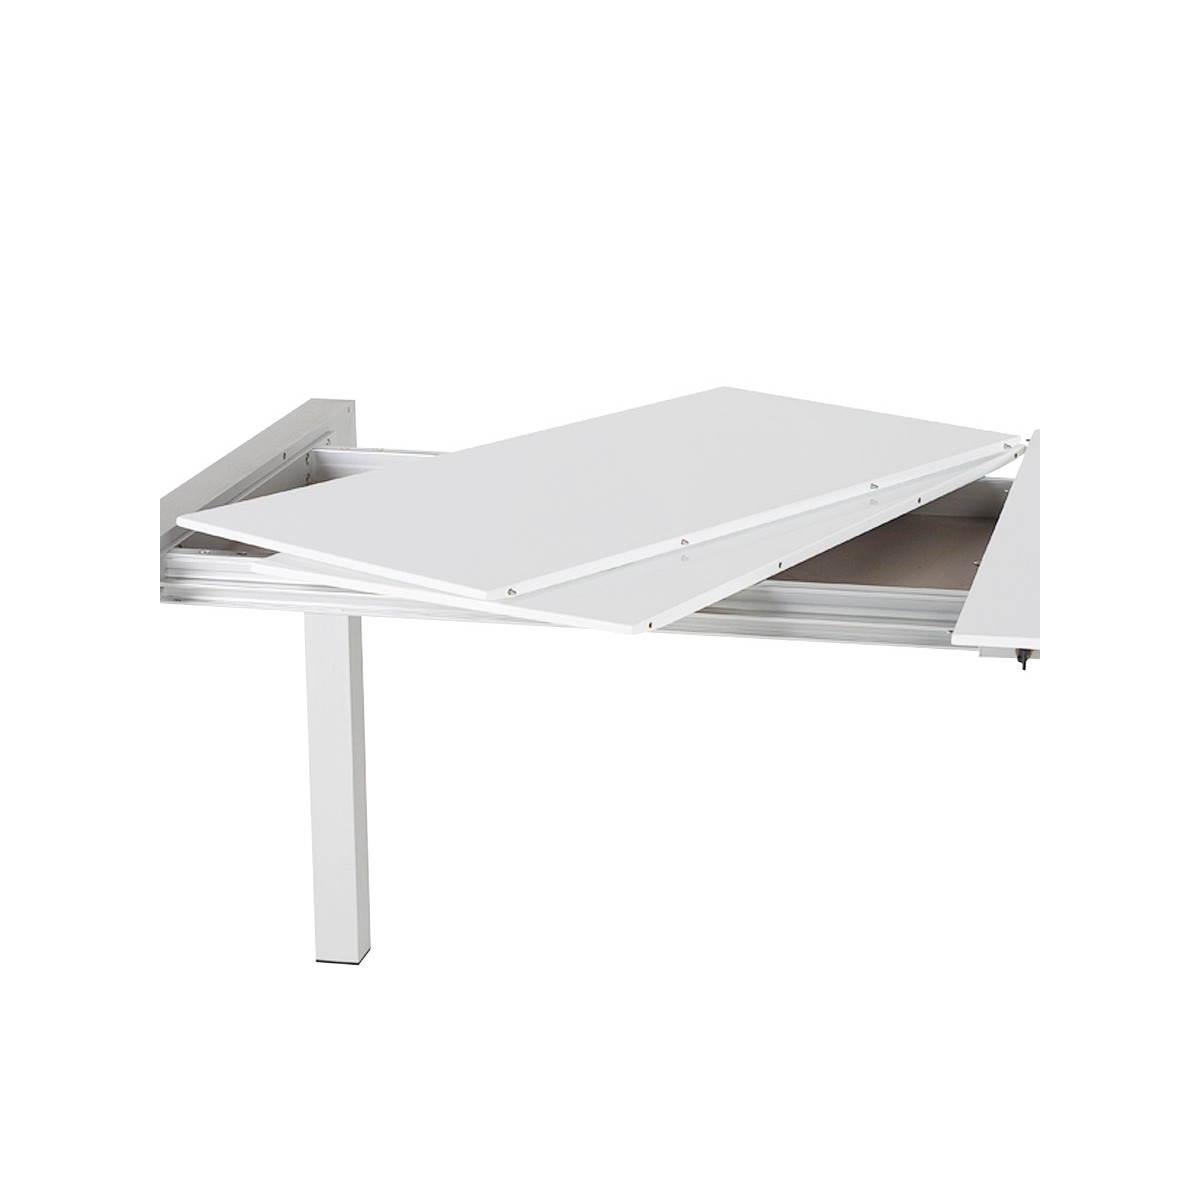 Table rectangulaire avec rallonges maison design for Ikea table rectangulaire